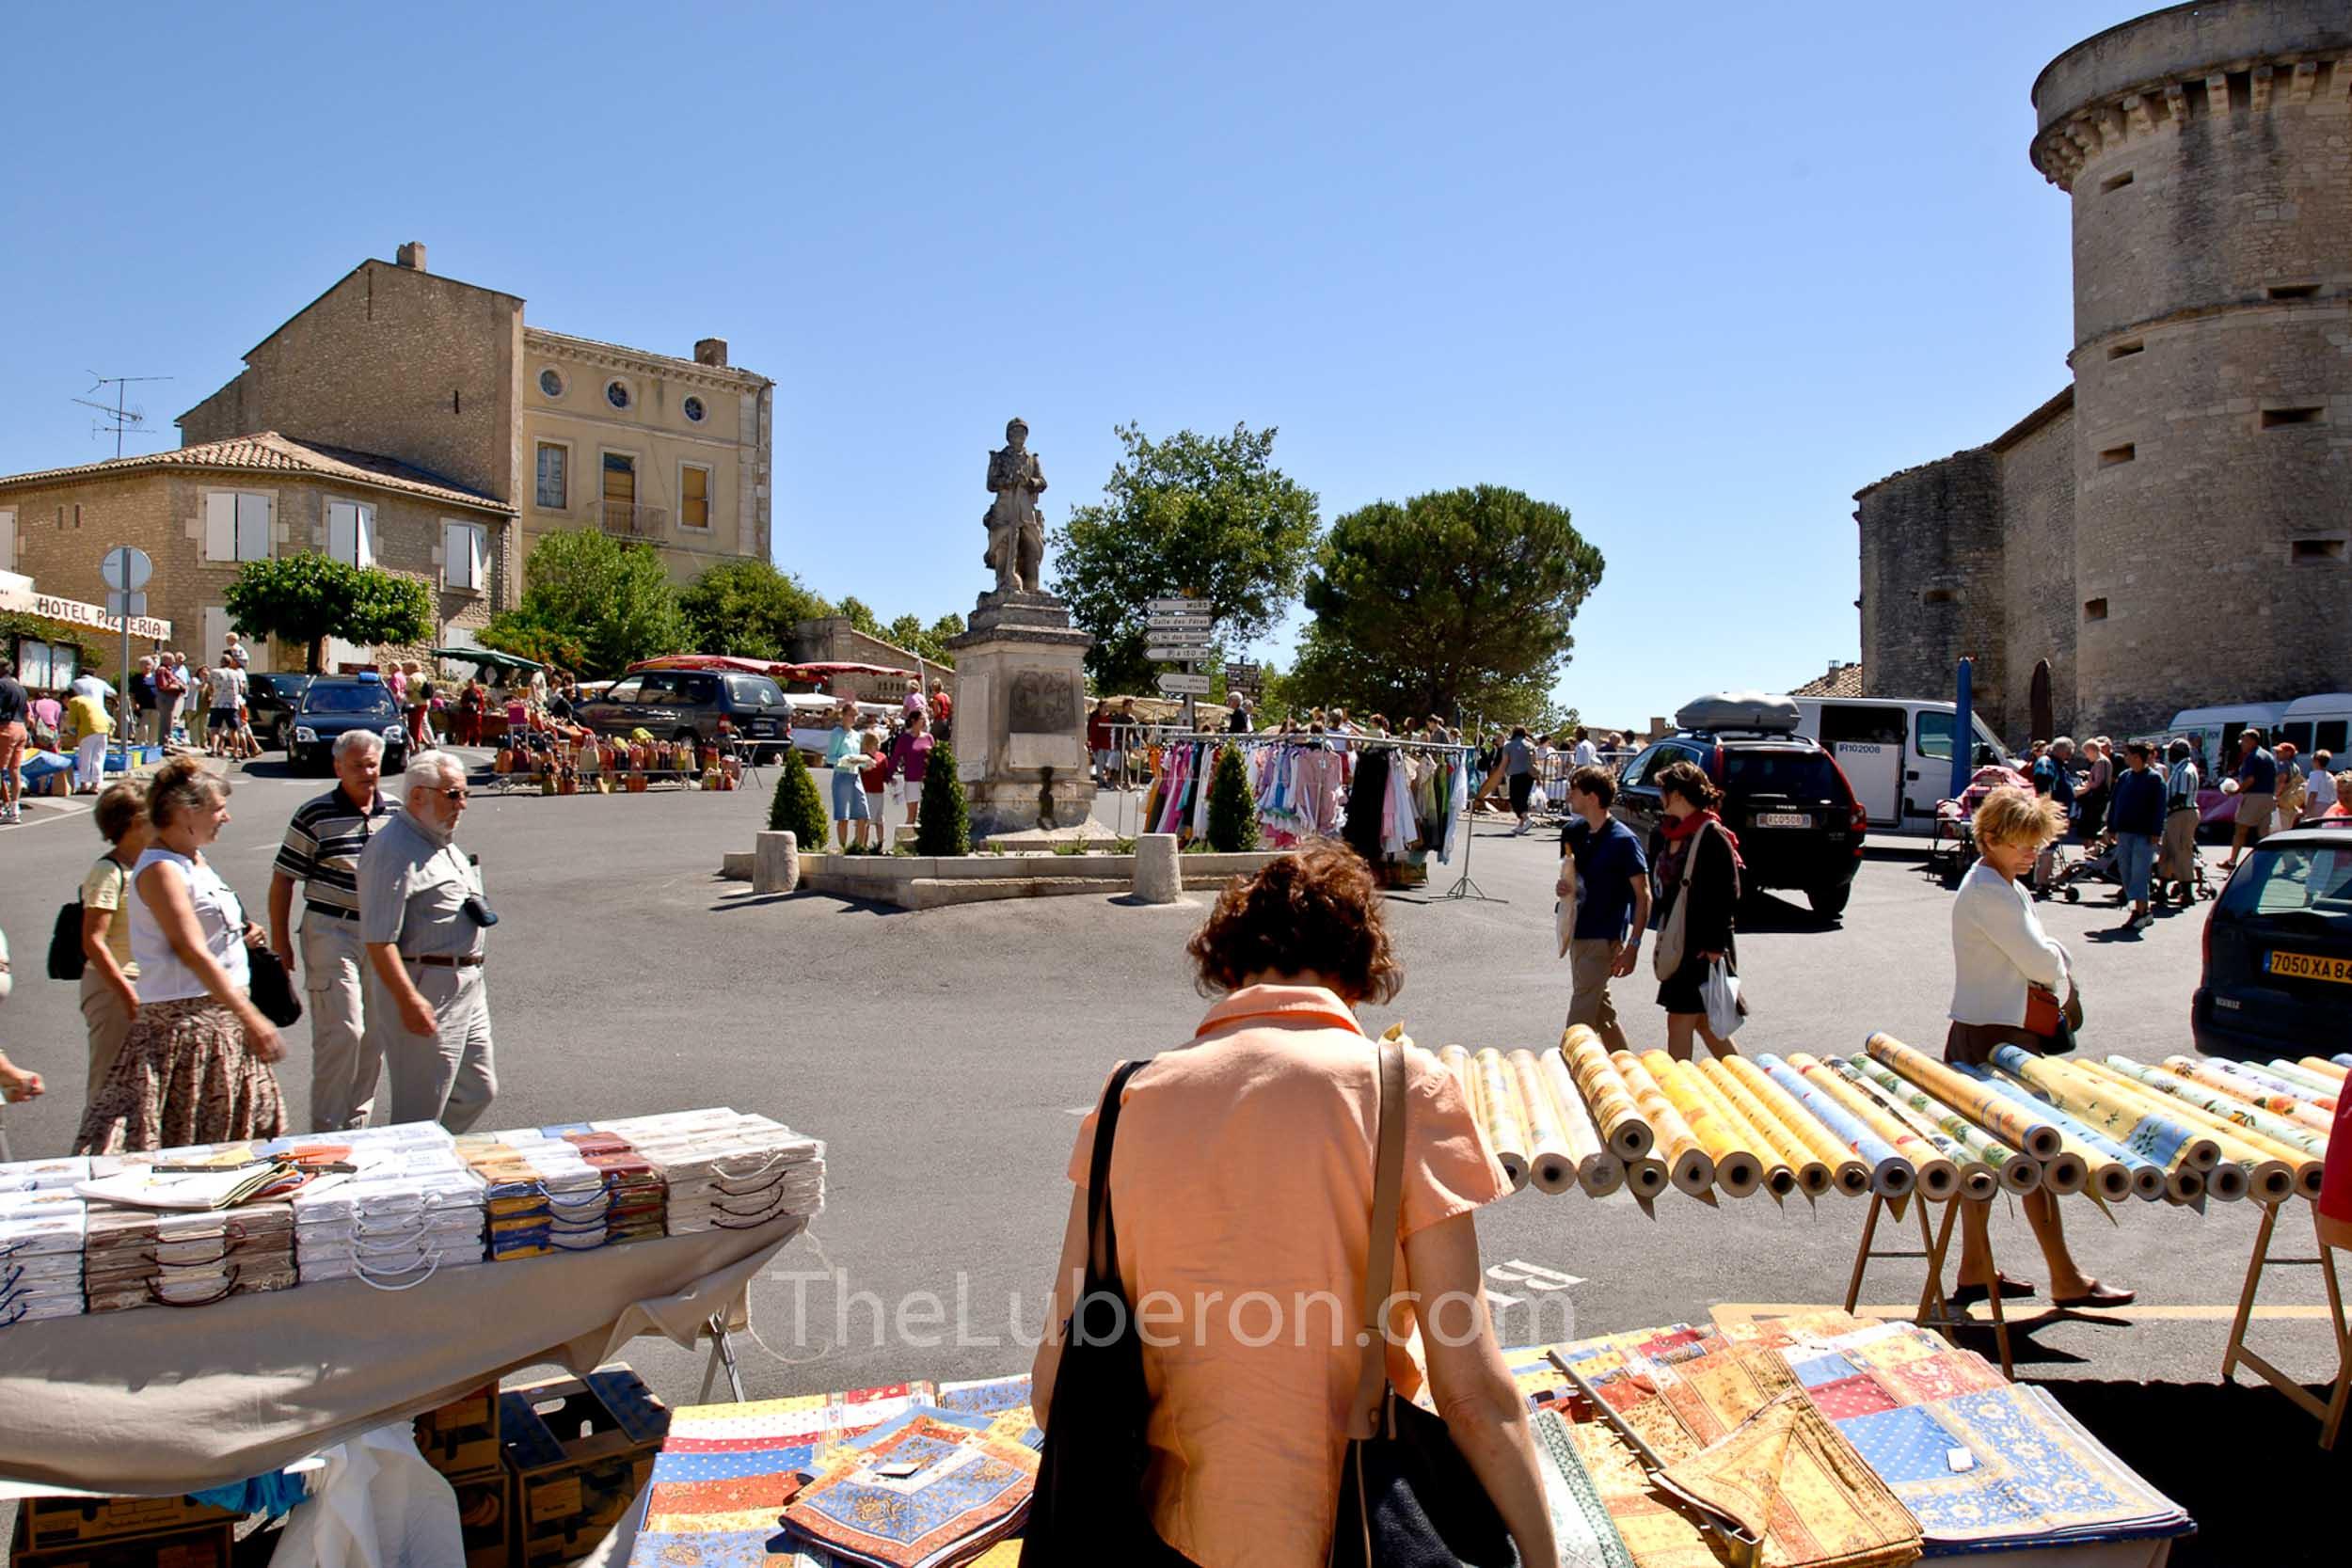 Gordes market in the main square